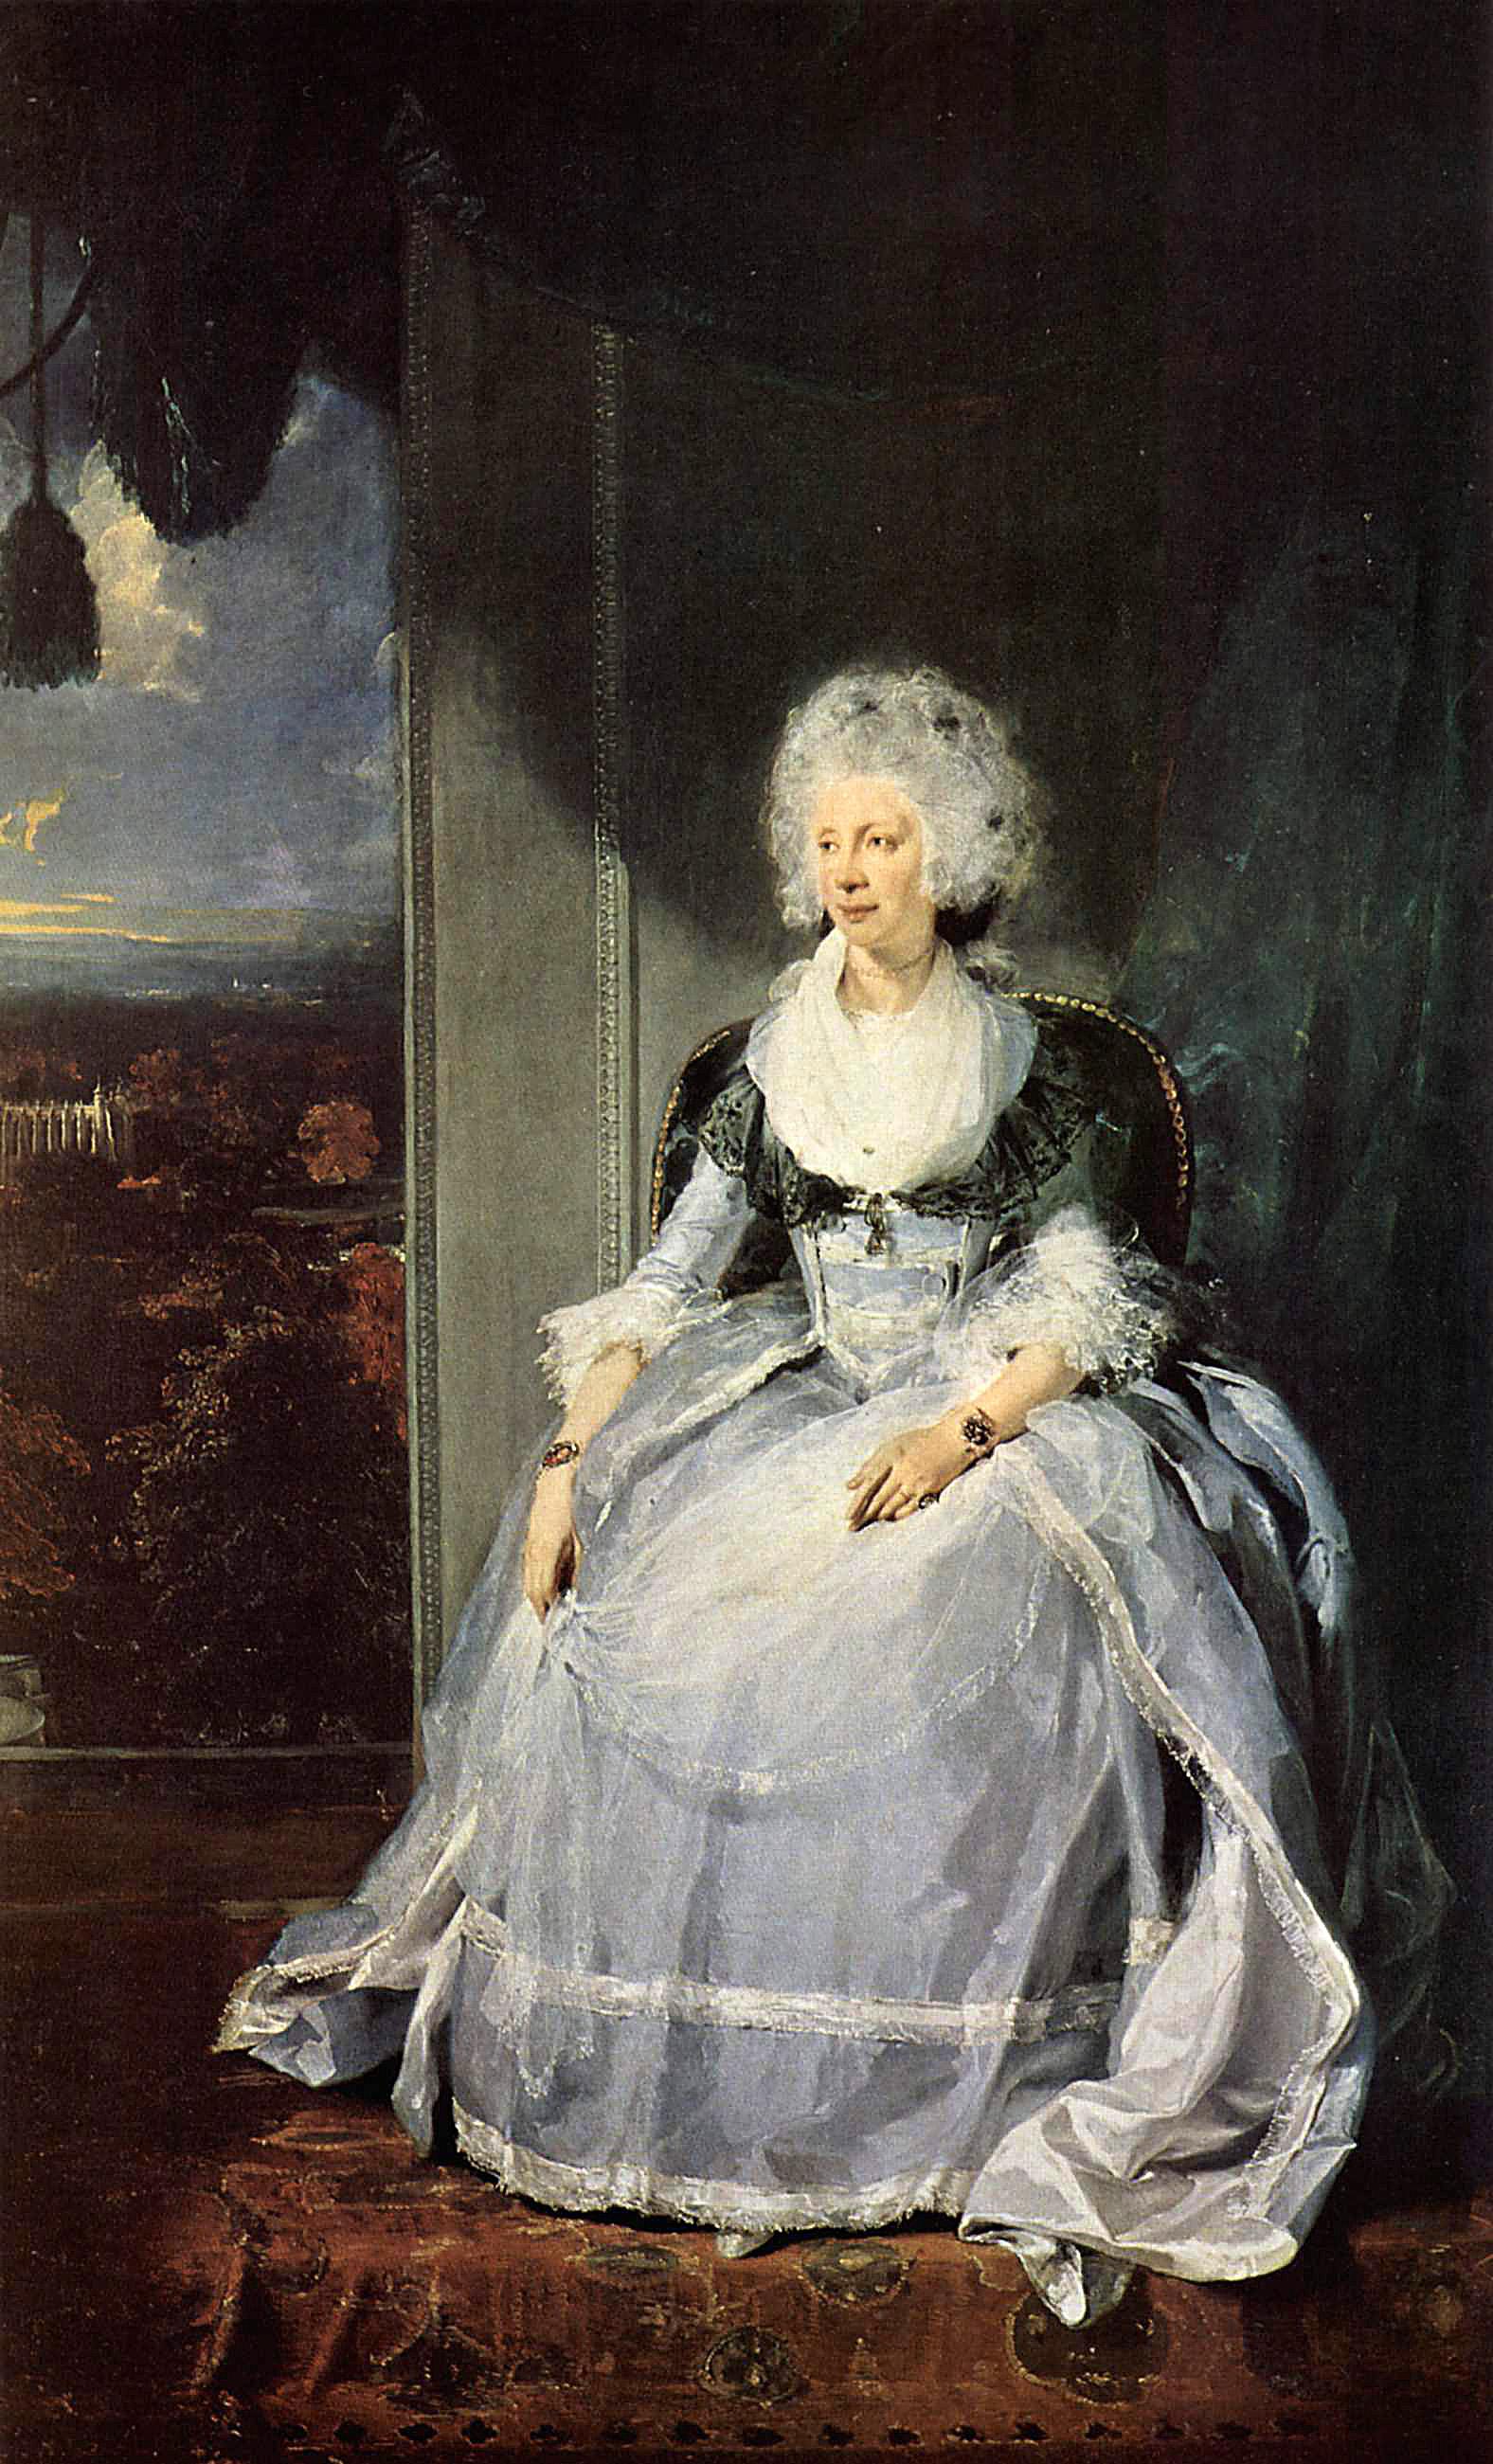 Sir Thomas Lawrence. Retrato de la reina Carlota de Inglaterra. 1789. National Gallery. Londres.